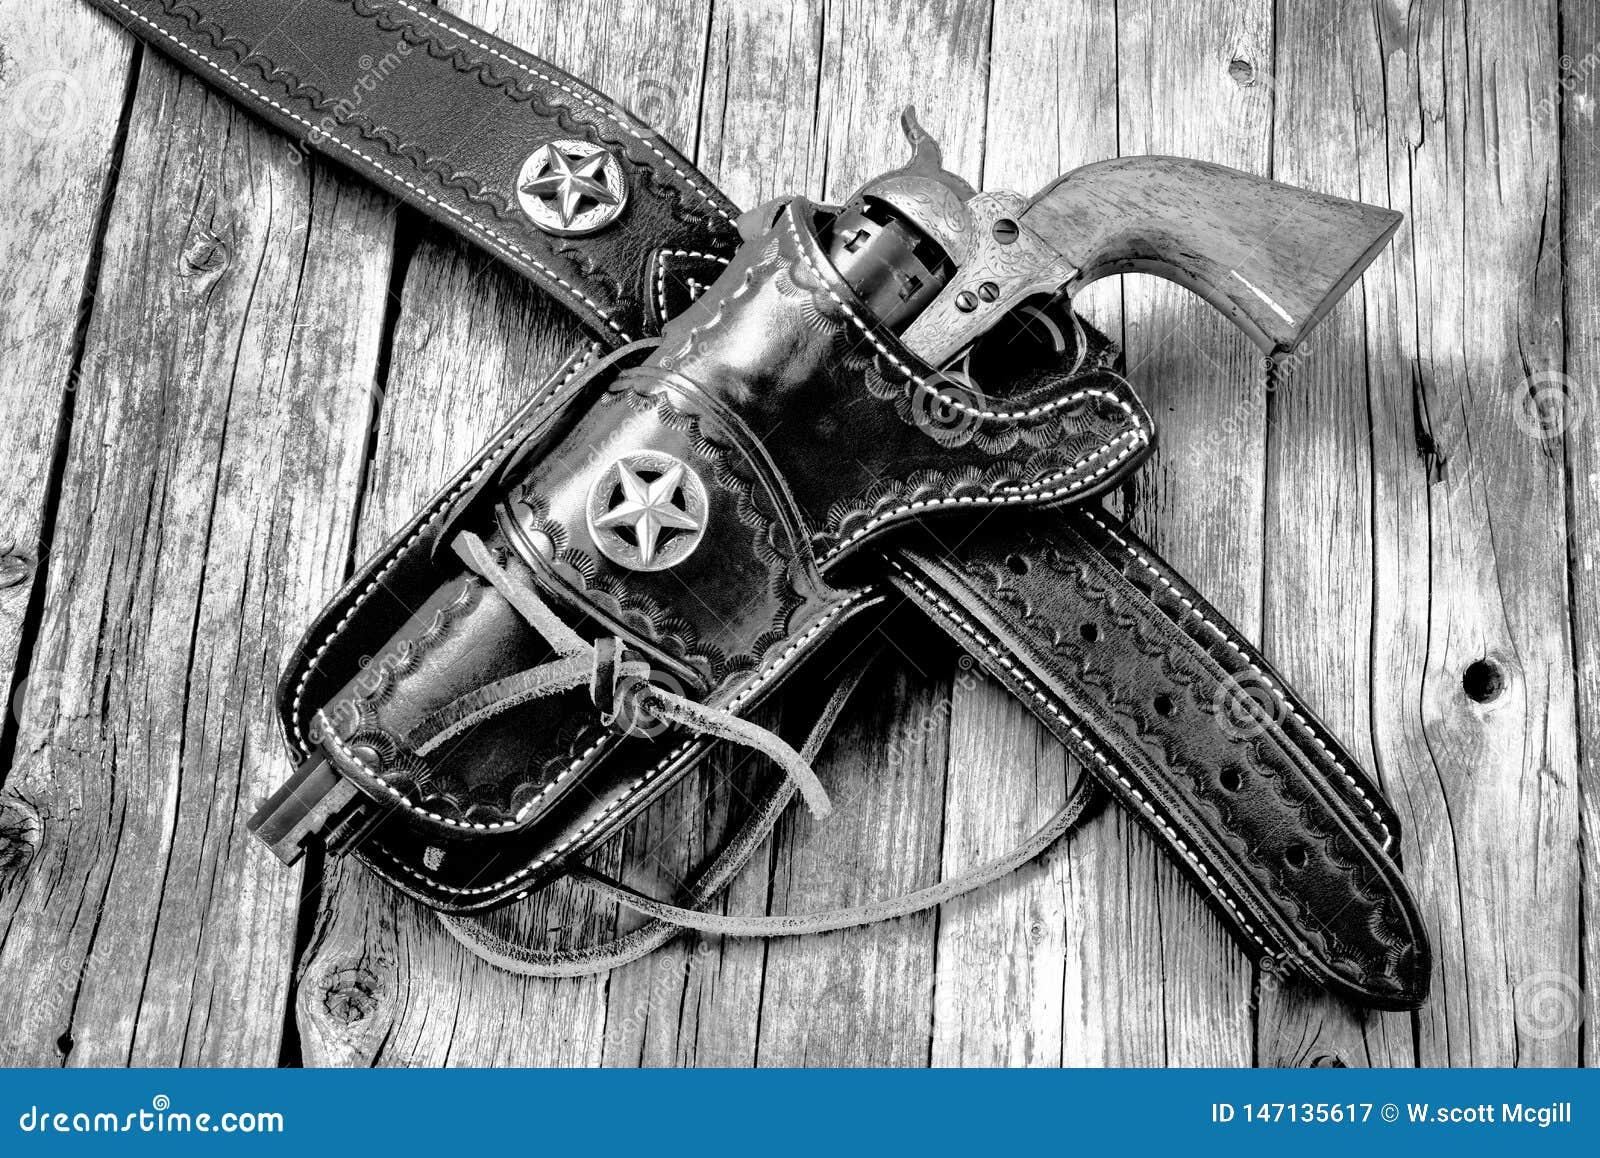 Antique Western pistol stock image  Image of cowboy - 147135617